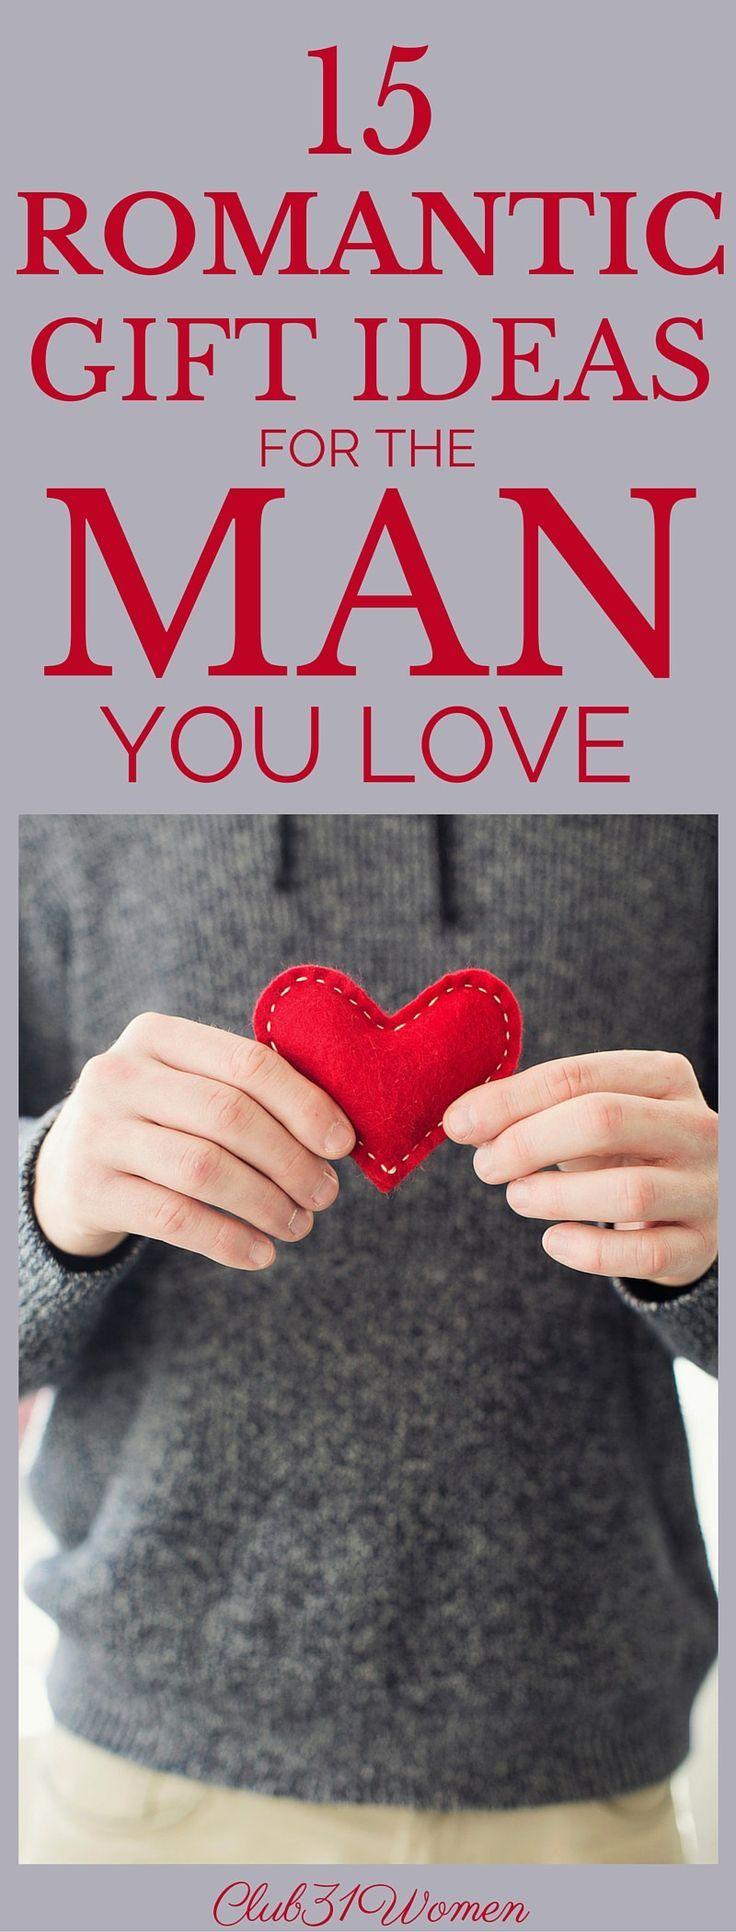 DIY Romantic Valentine's Day Ideas for Him | Boyfriends and Romantic